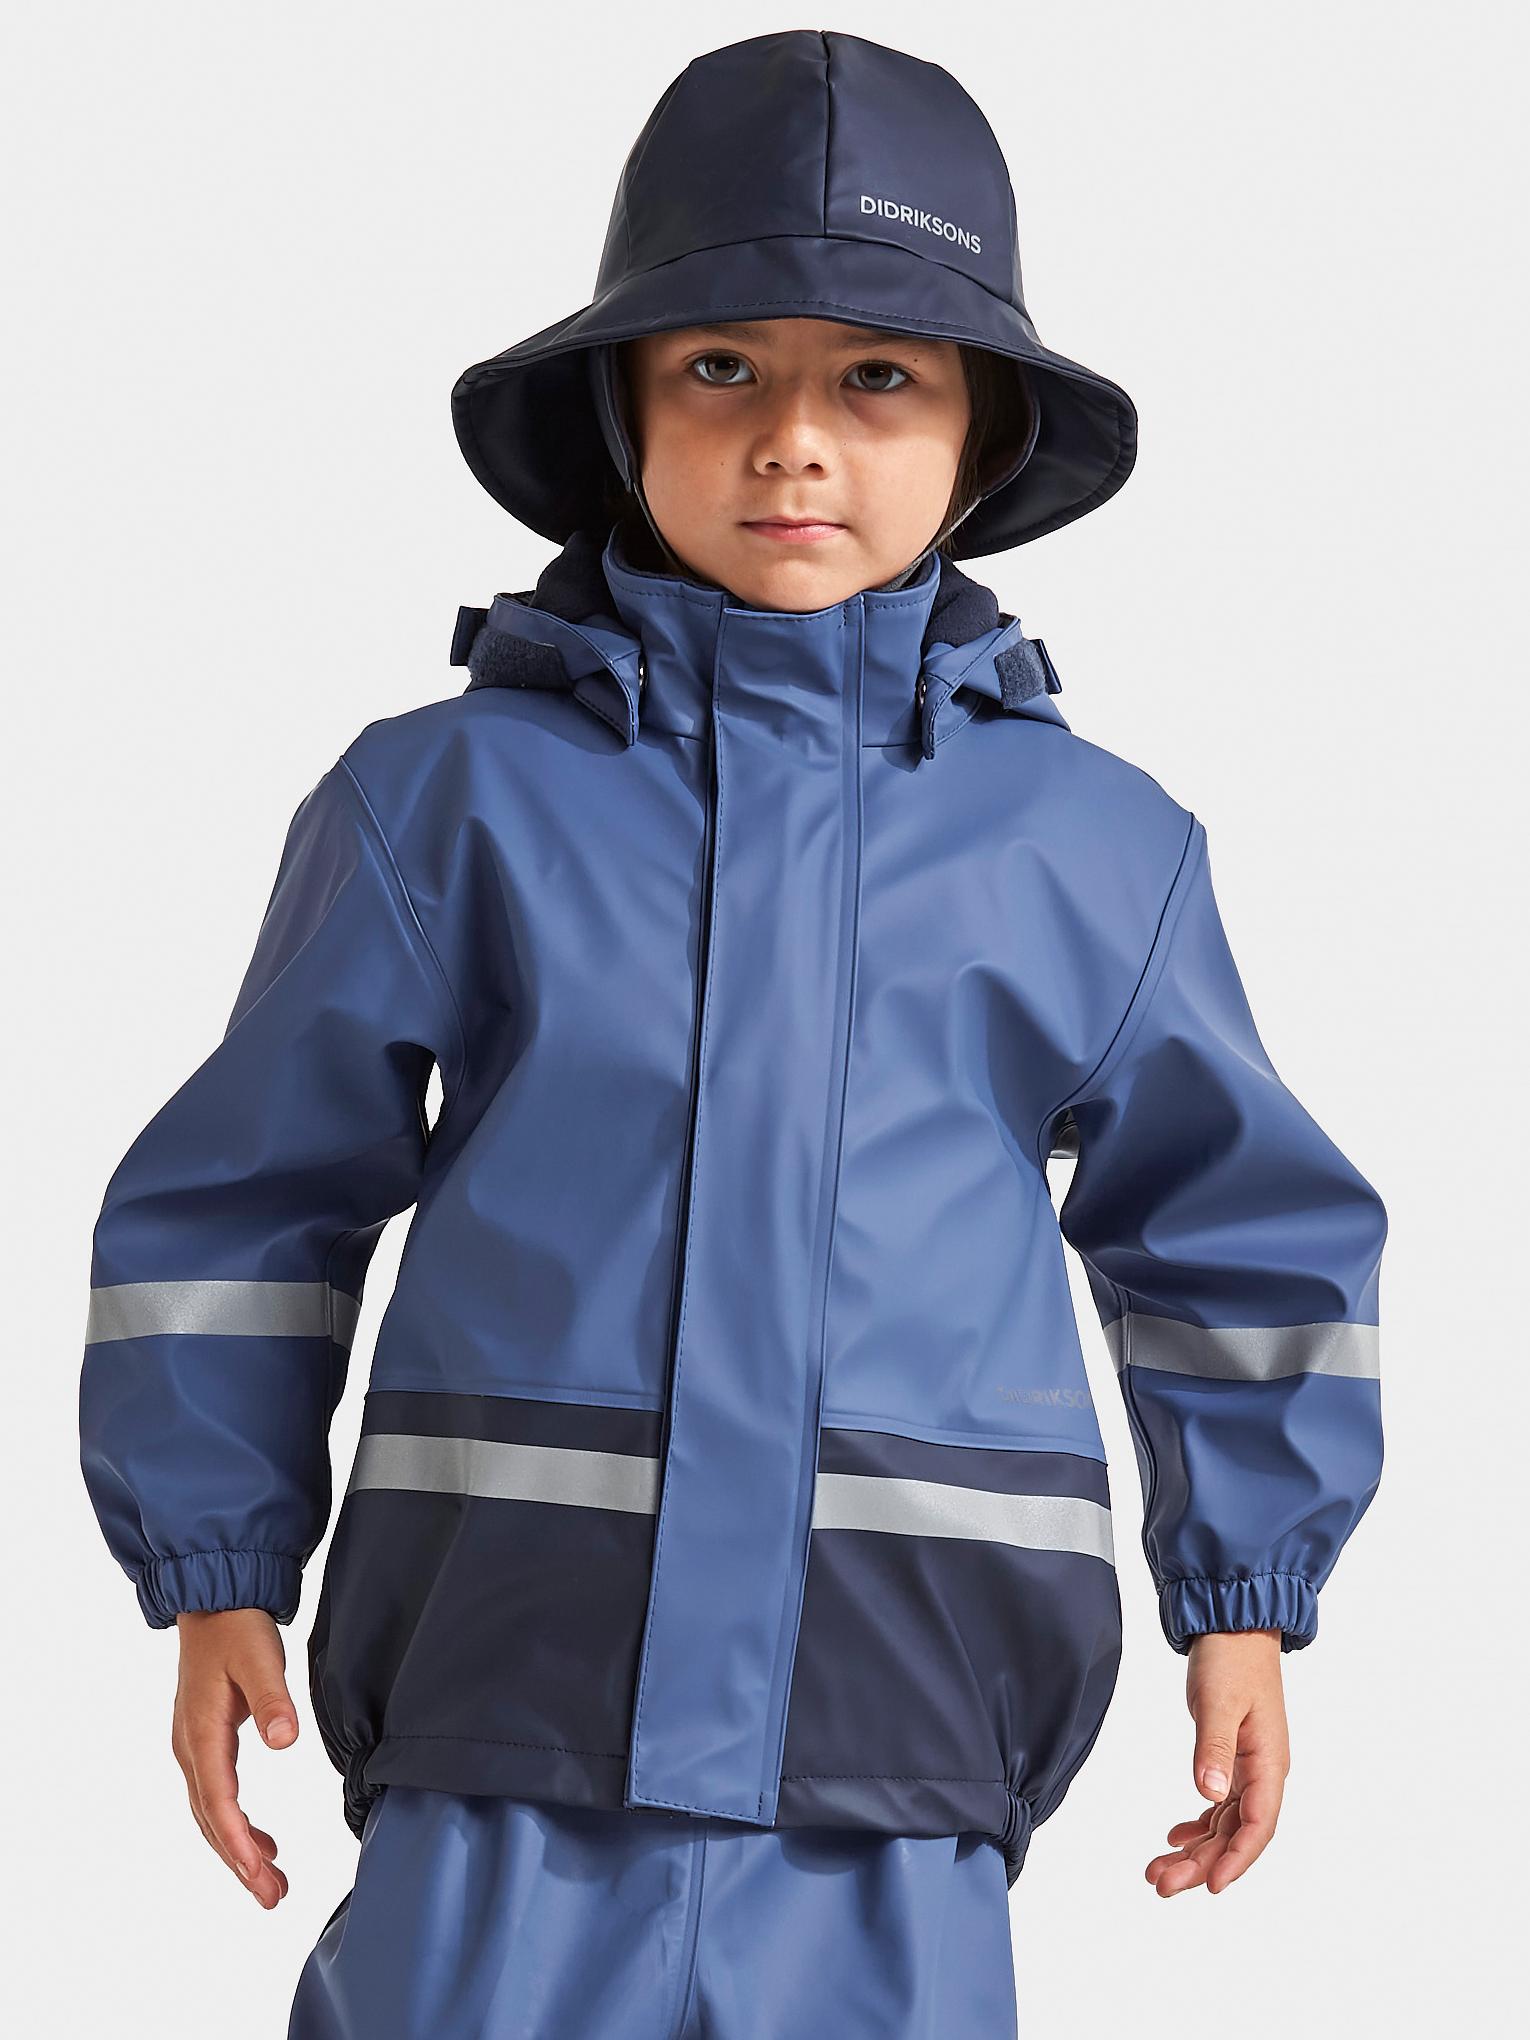 Didriksons Jungen Cap Schirmmütze SOUTHWEST KIDS 4 dunkelblau winddicht